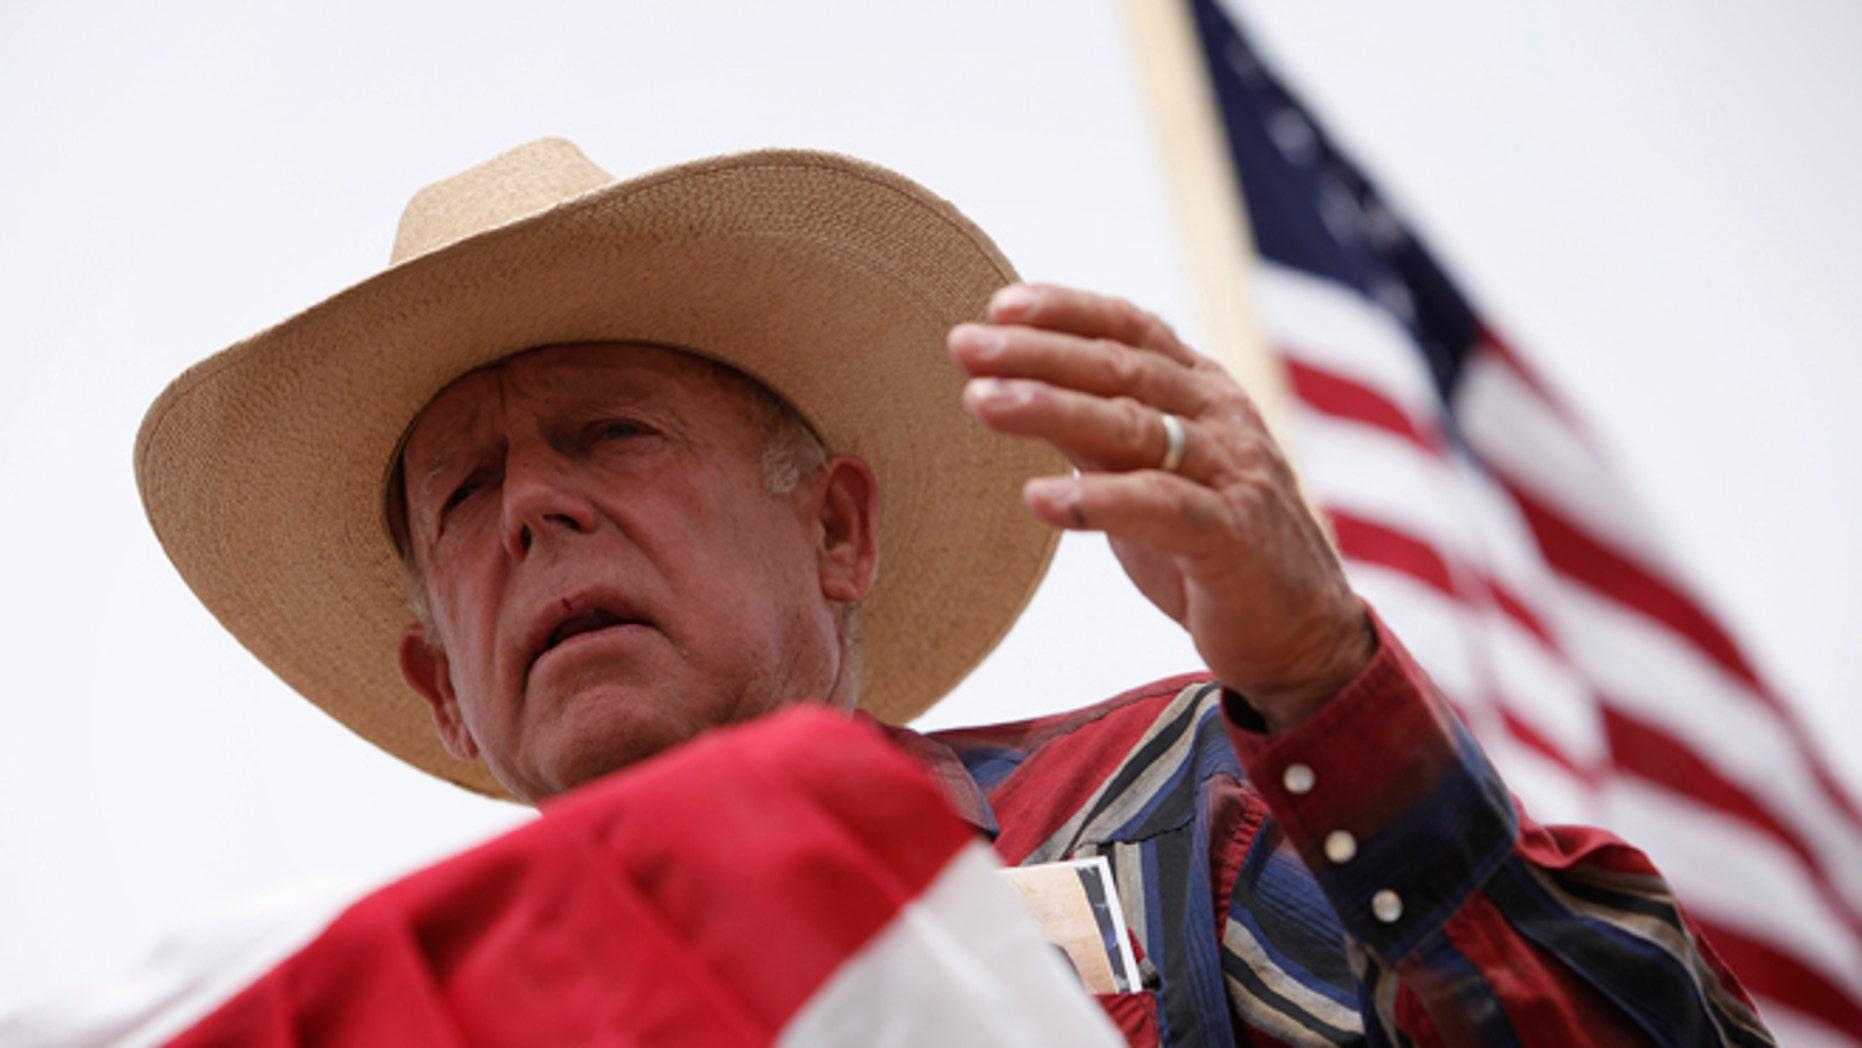 April 18, 2014: Rancher Cliven Bundy speaks at a protest camp near Bunkerville, Nevada.